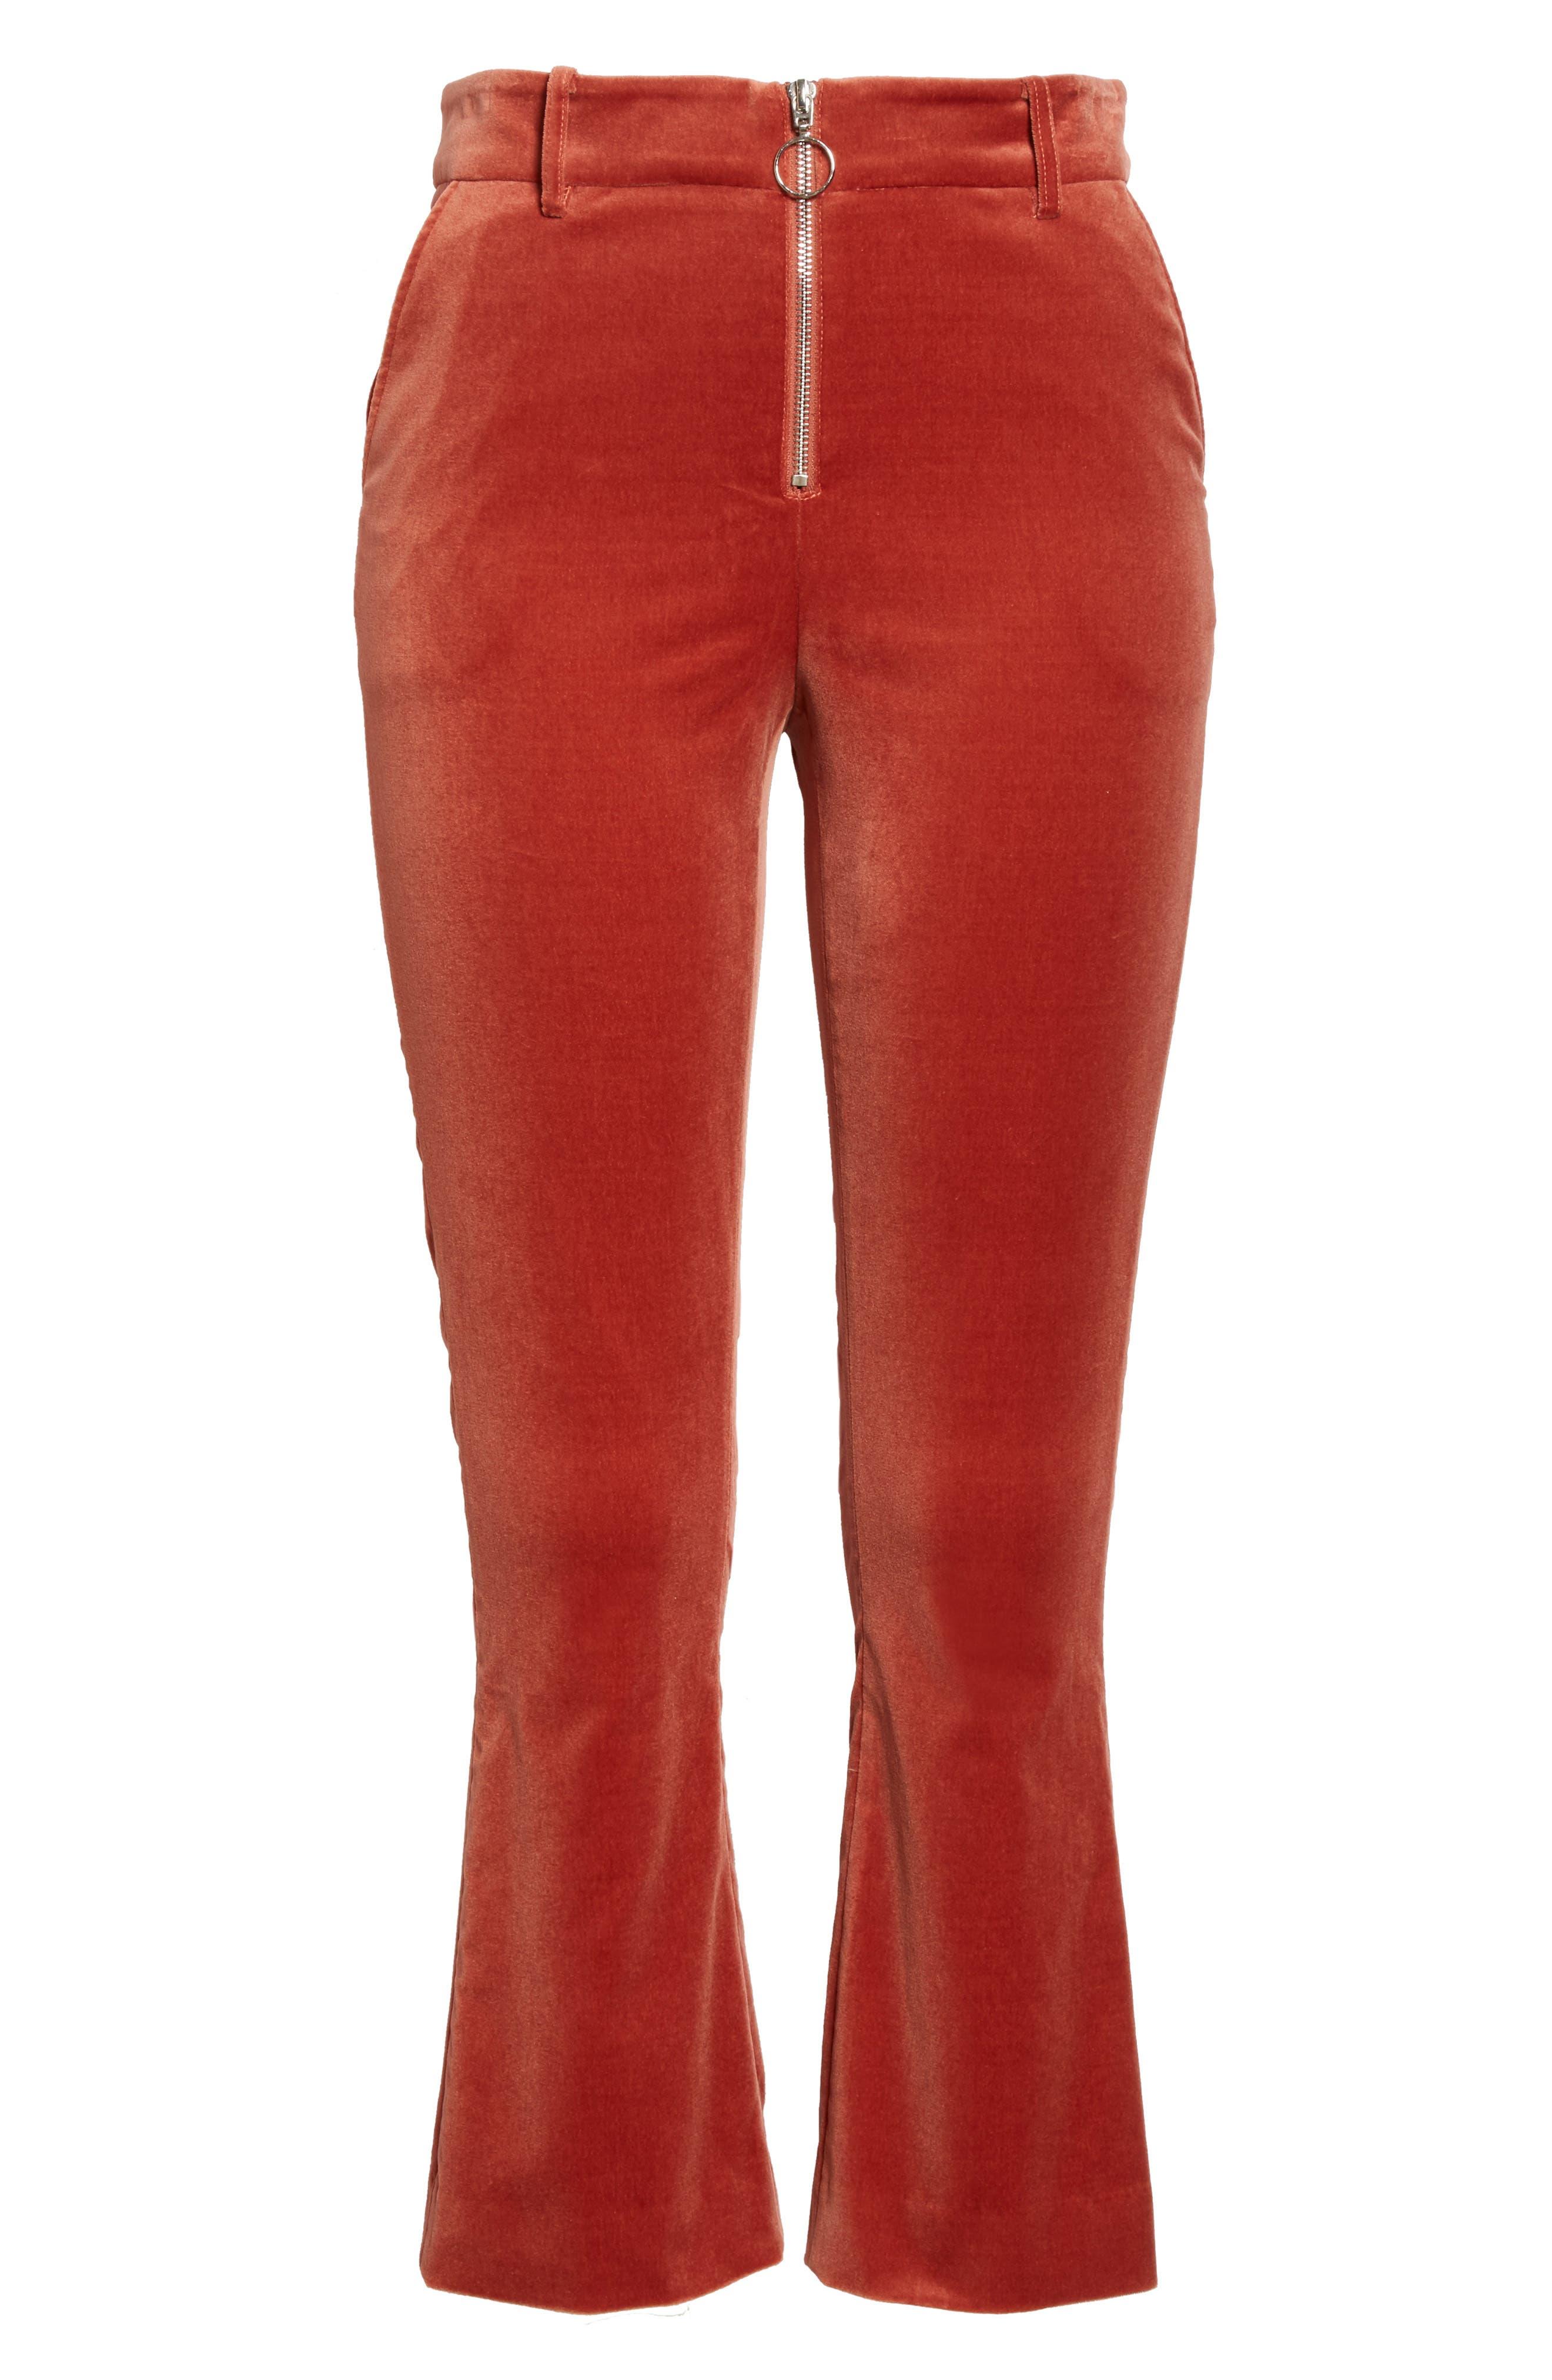 O-Ring Velvet Crop Flare Pants,                             Alternate thumbnail 7, color,                             Spice